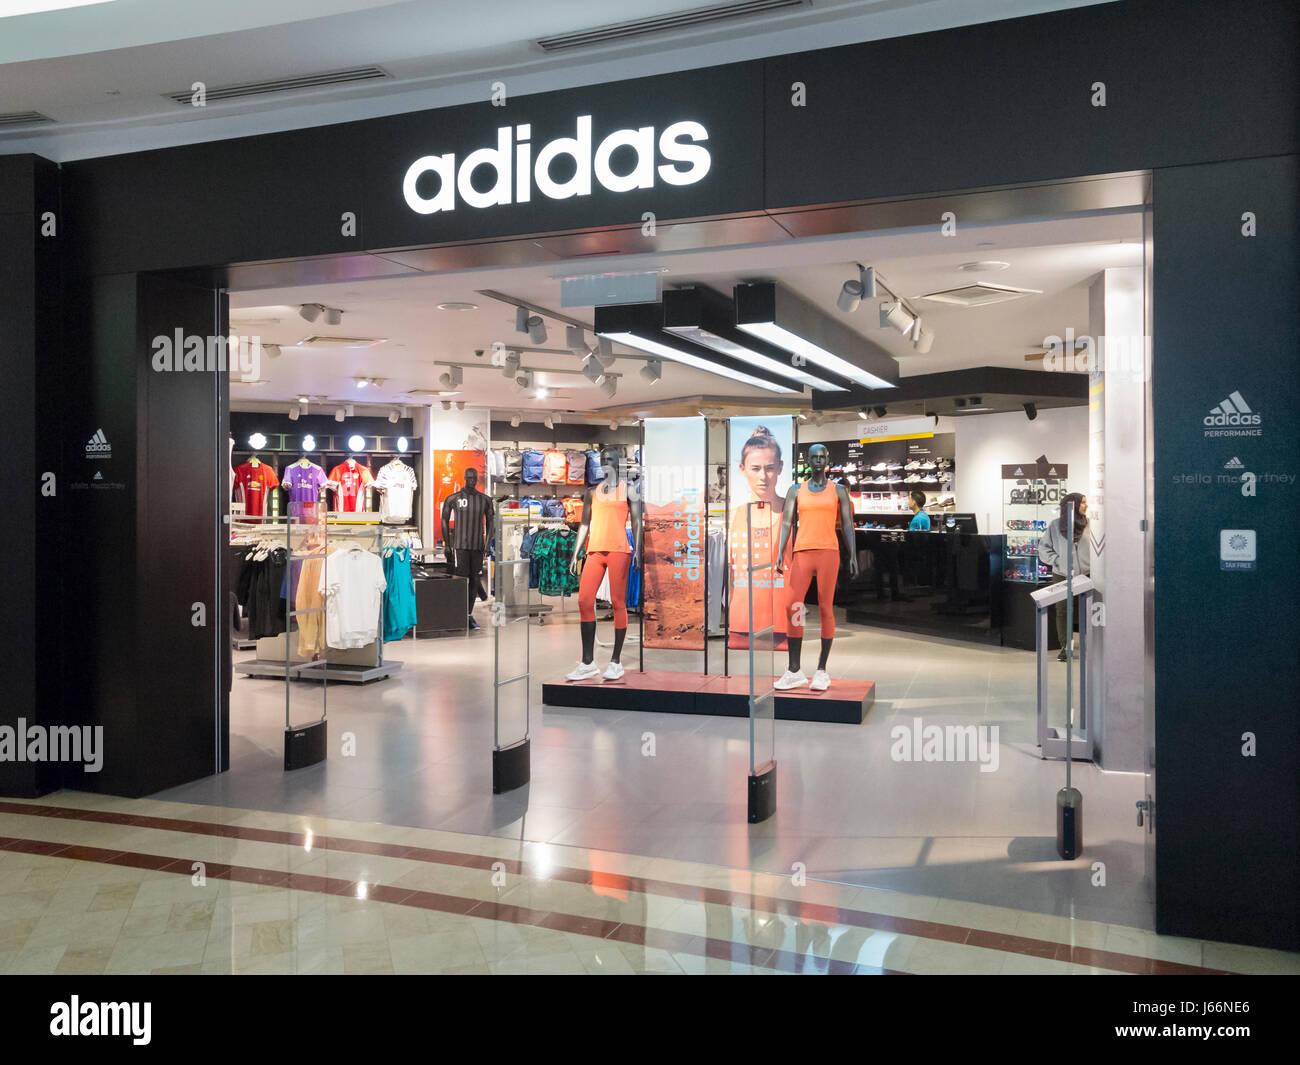 06d34931163 Adidas shop